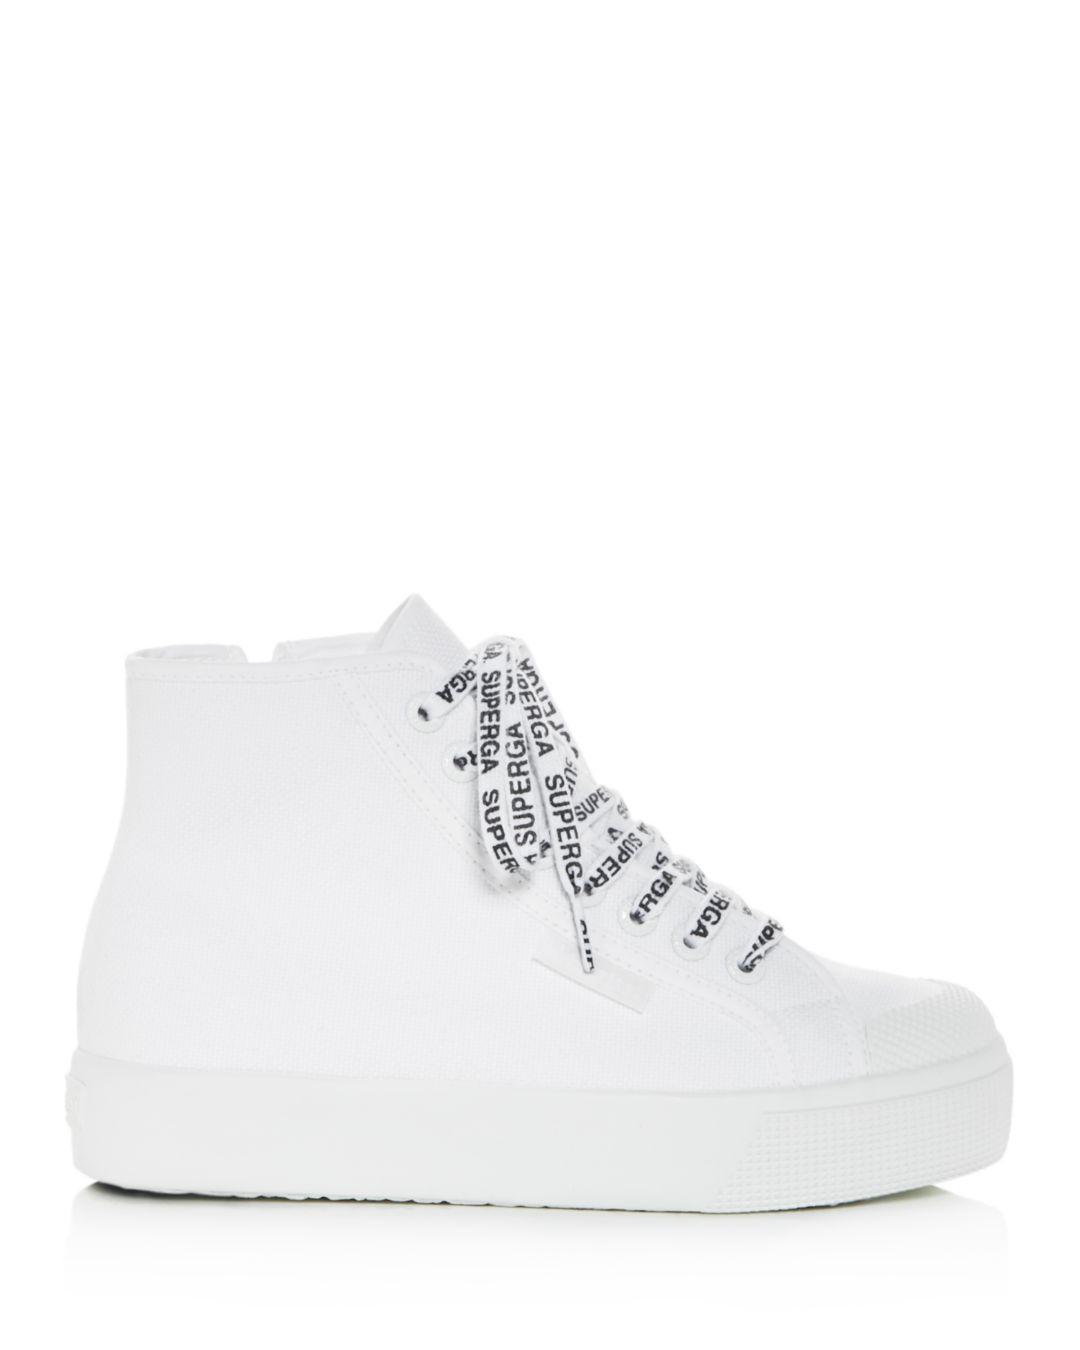 2b790ab5db47 Lyst - Superga Women s Cotu Classic High-top Platform Sneakers in White